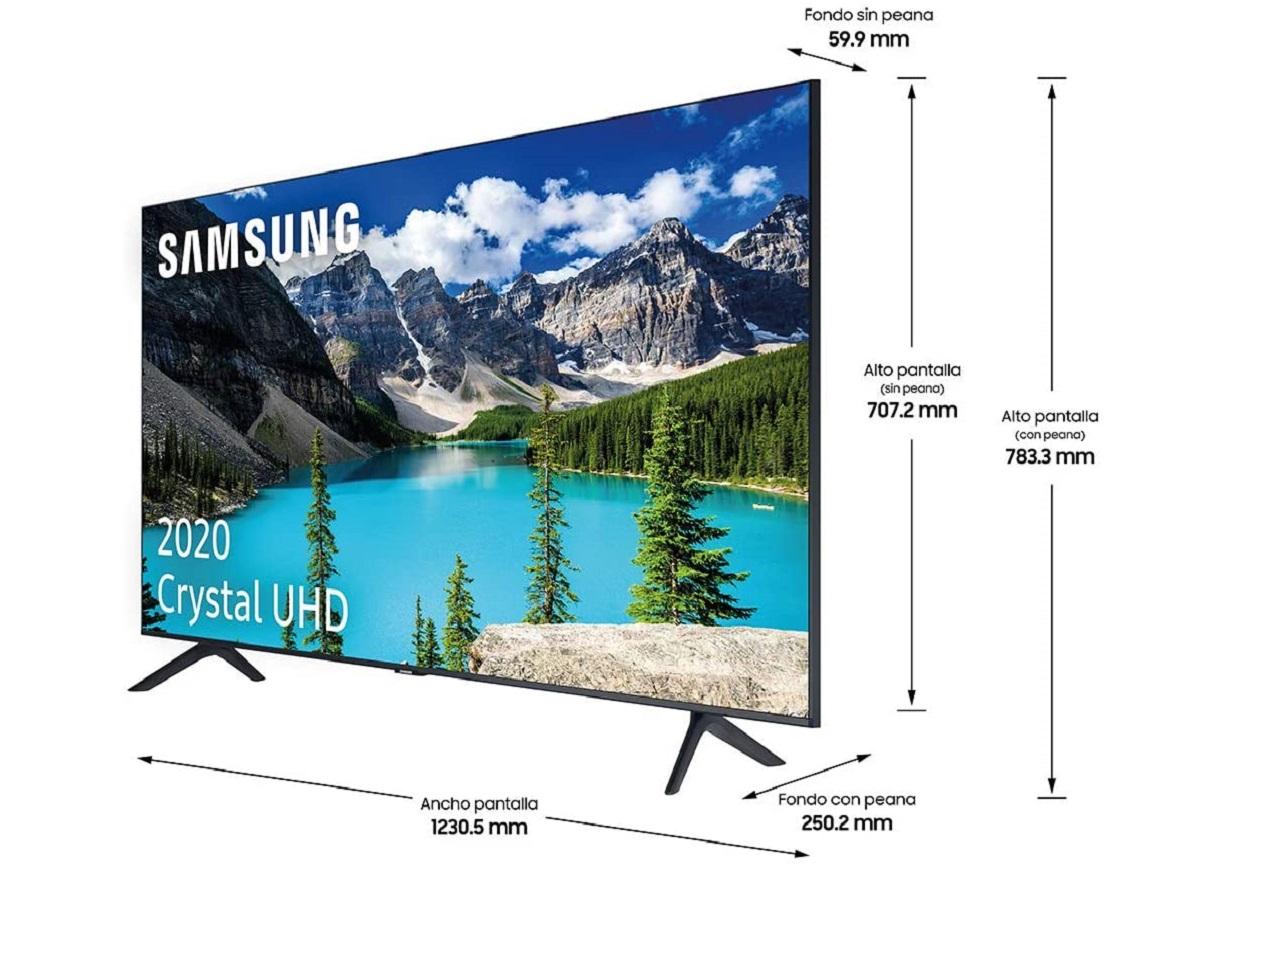 Samsung Crystal UHD 2020 55TU8005